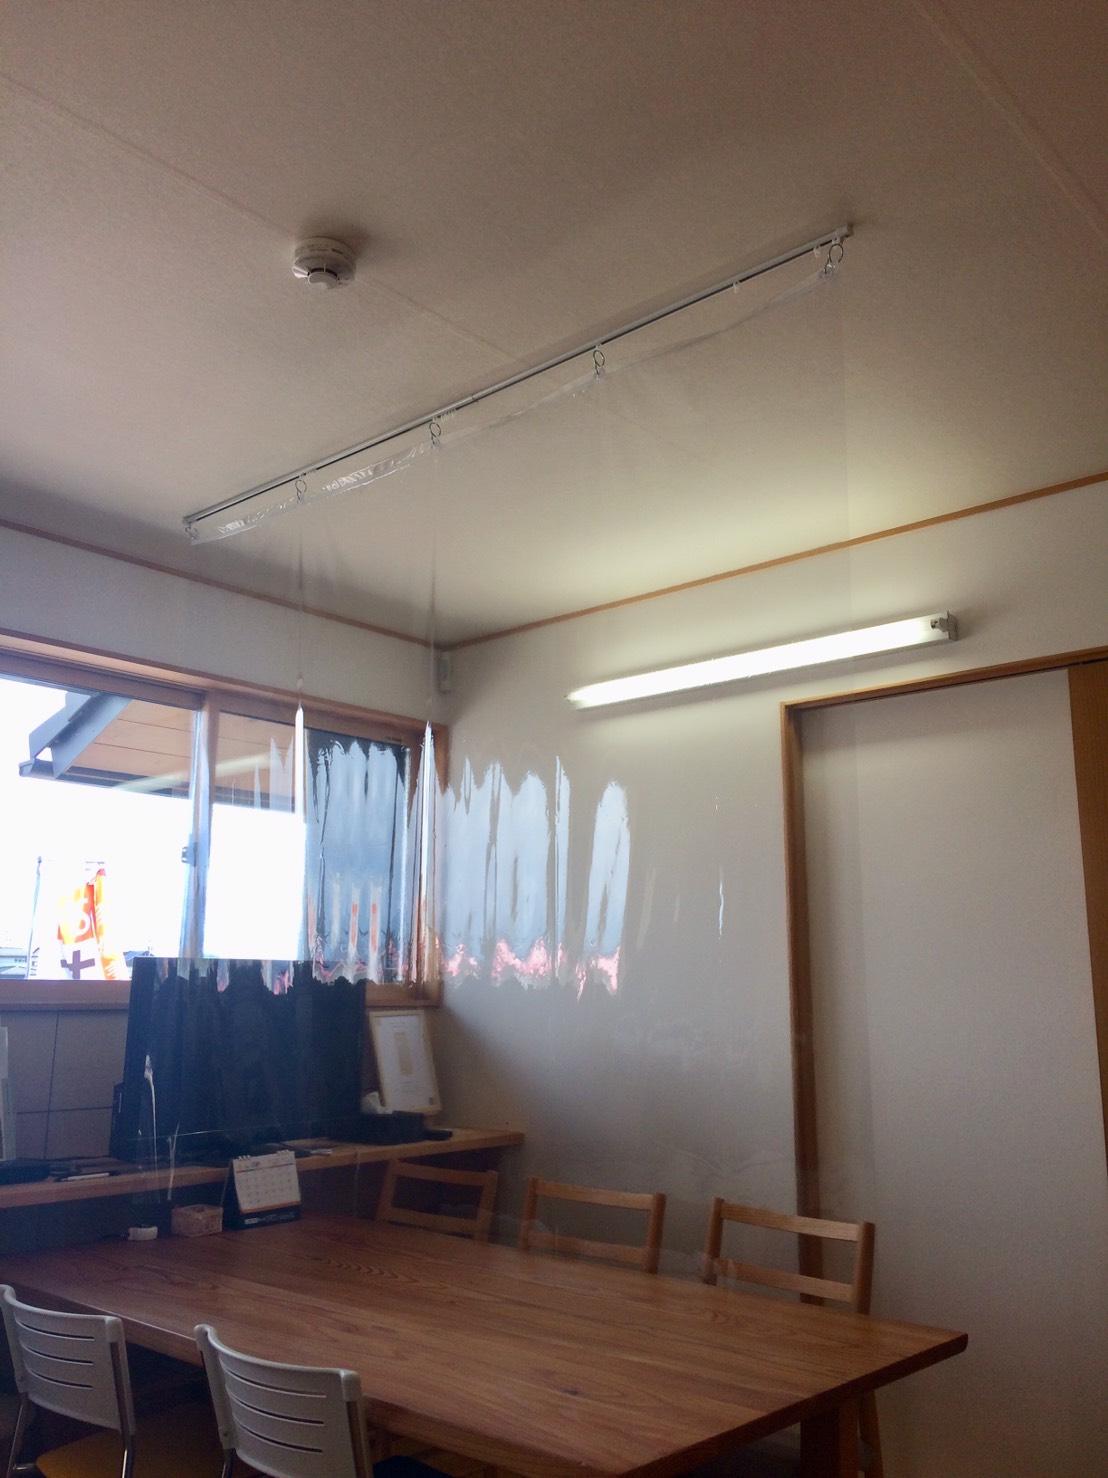 https://n-ko.jp/staffblog/hn200530.jpg